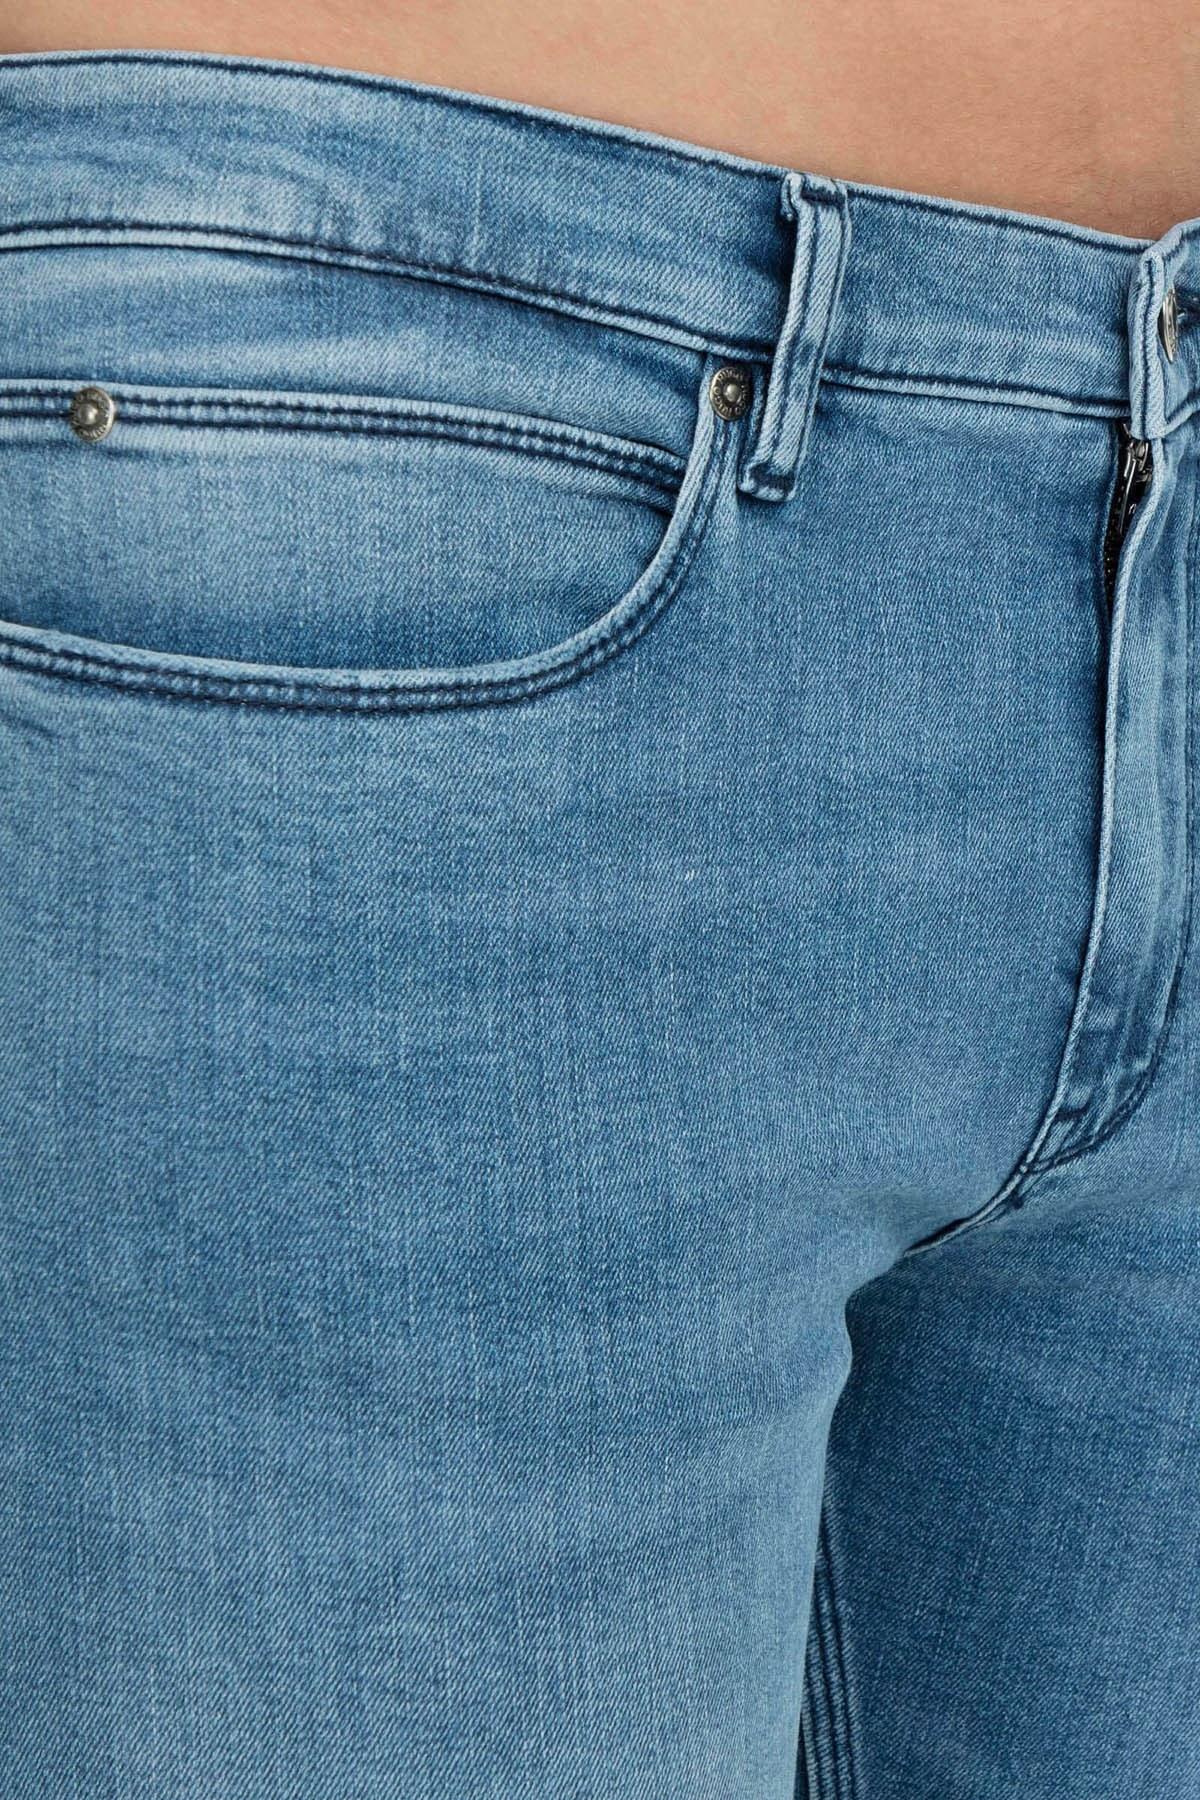 Hugo Boss Jeans Erkek Kot Pantolon 50406471 430 MAVİ